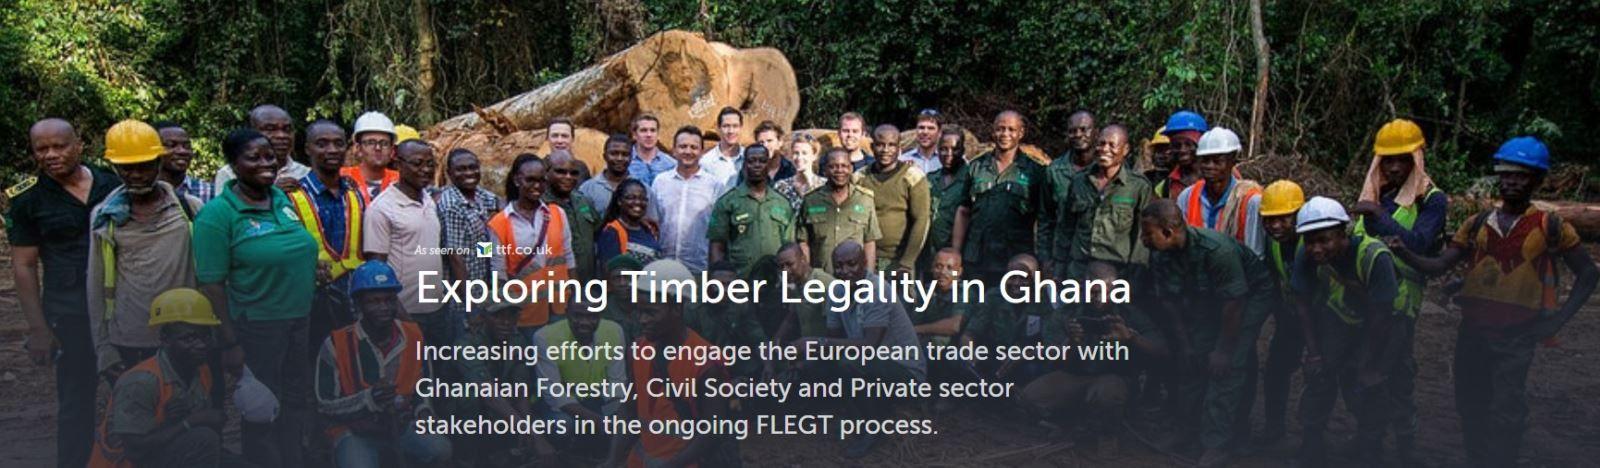 exploring timber legality ghana